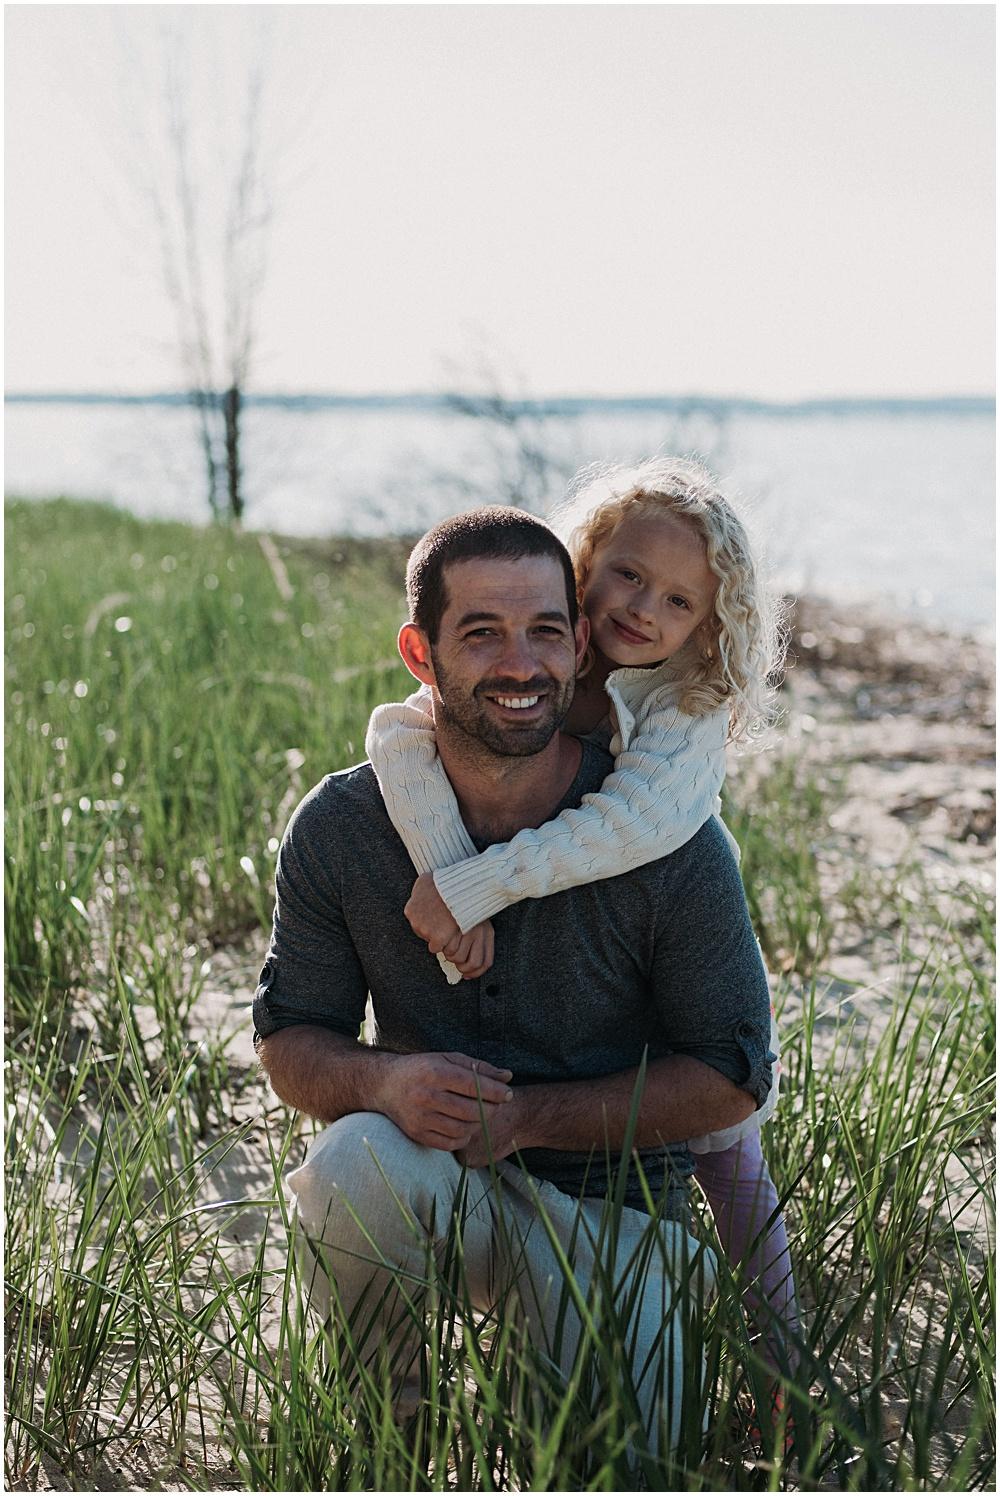 Lifestyle Family Photographer Traverse City